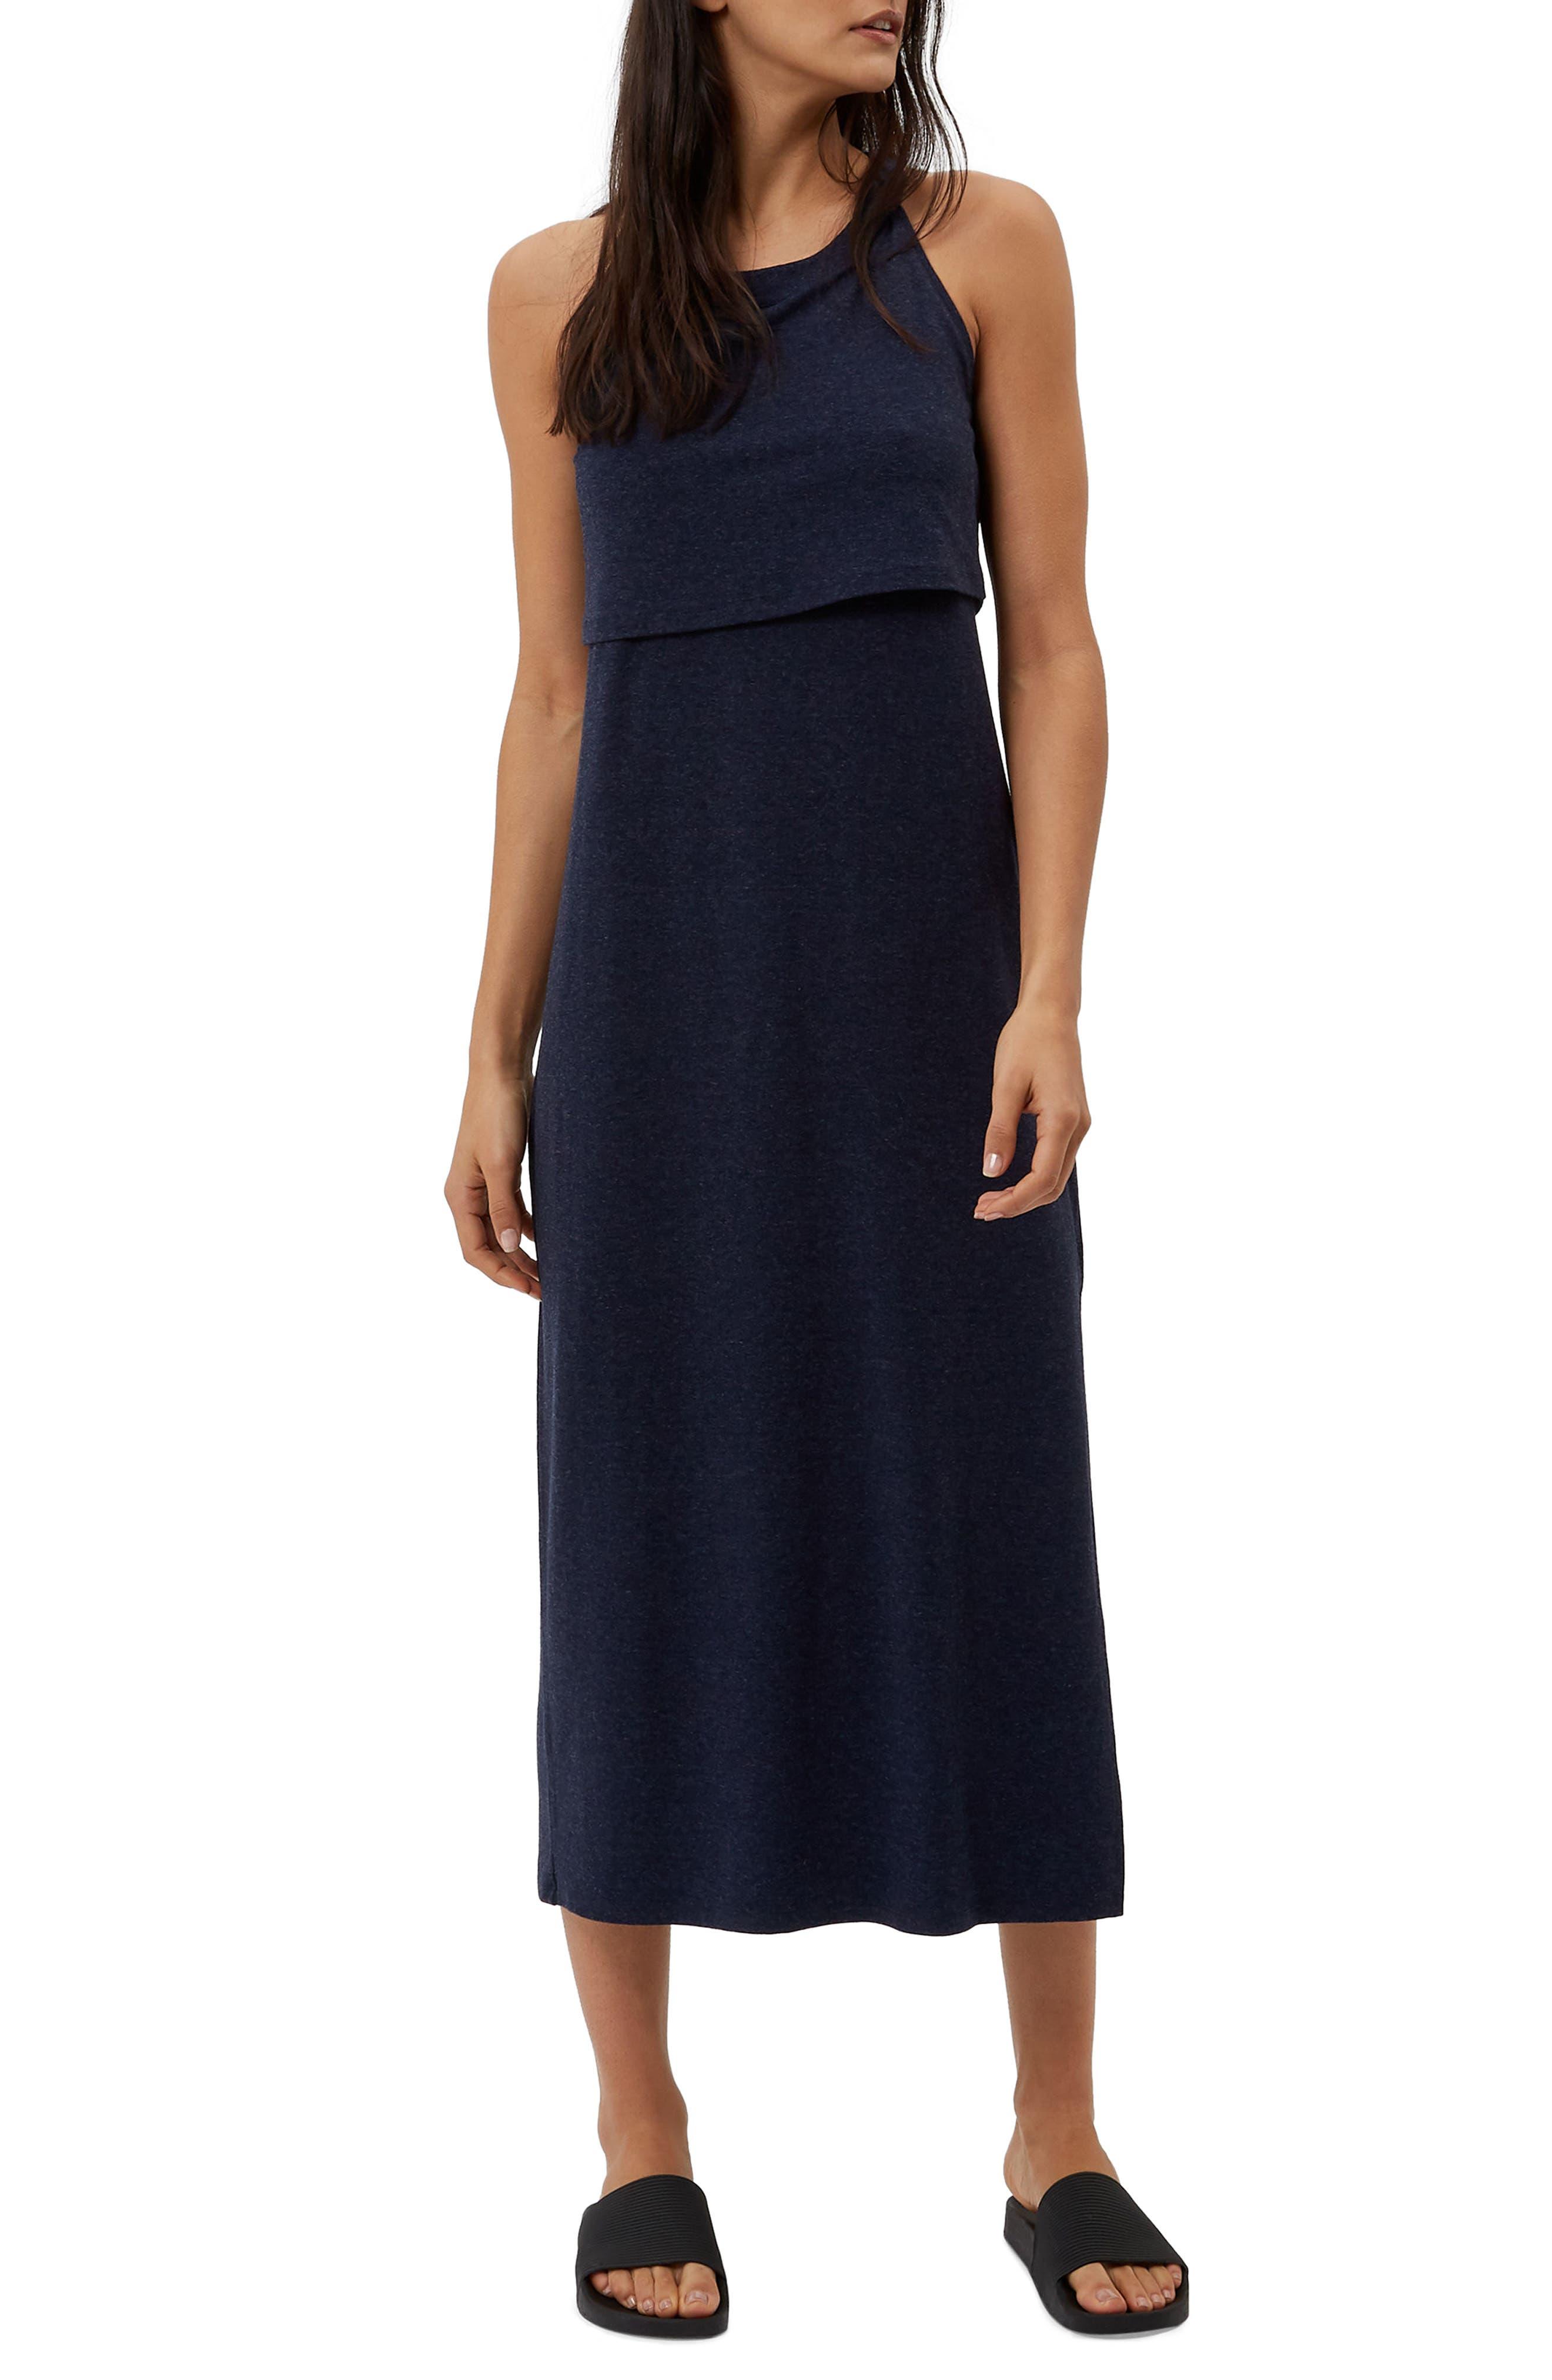 Main Image - Sweaty Betty Holistic Dress